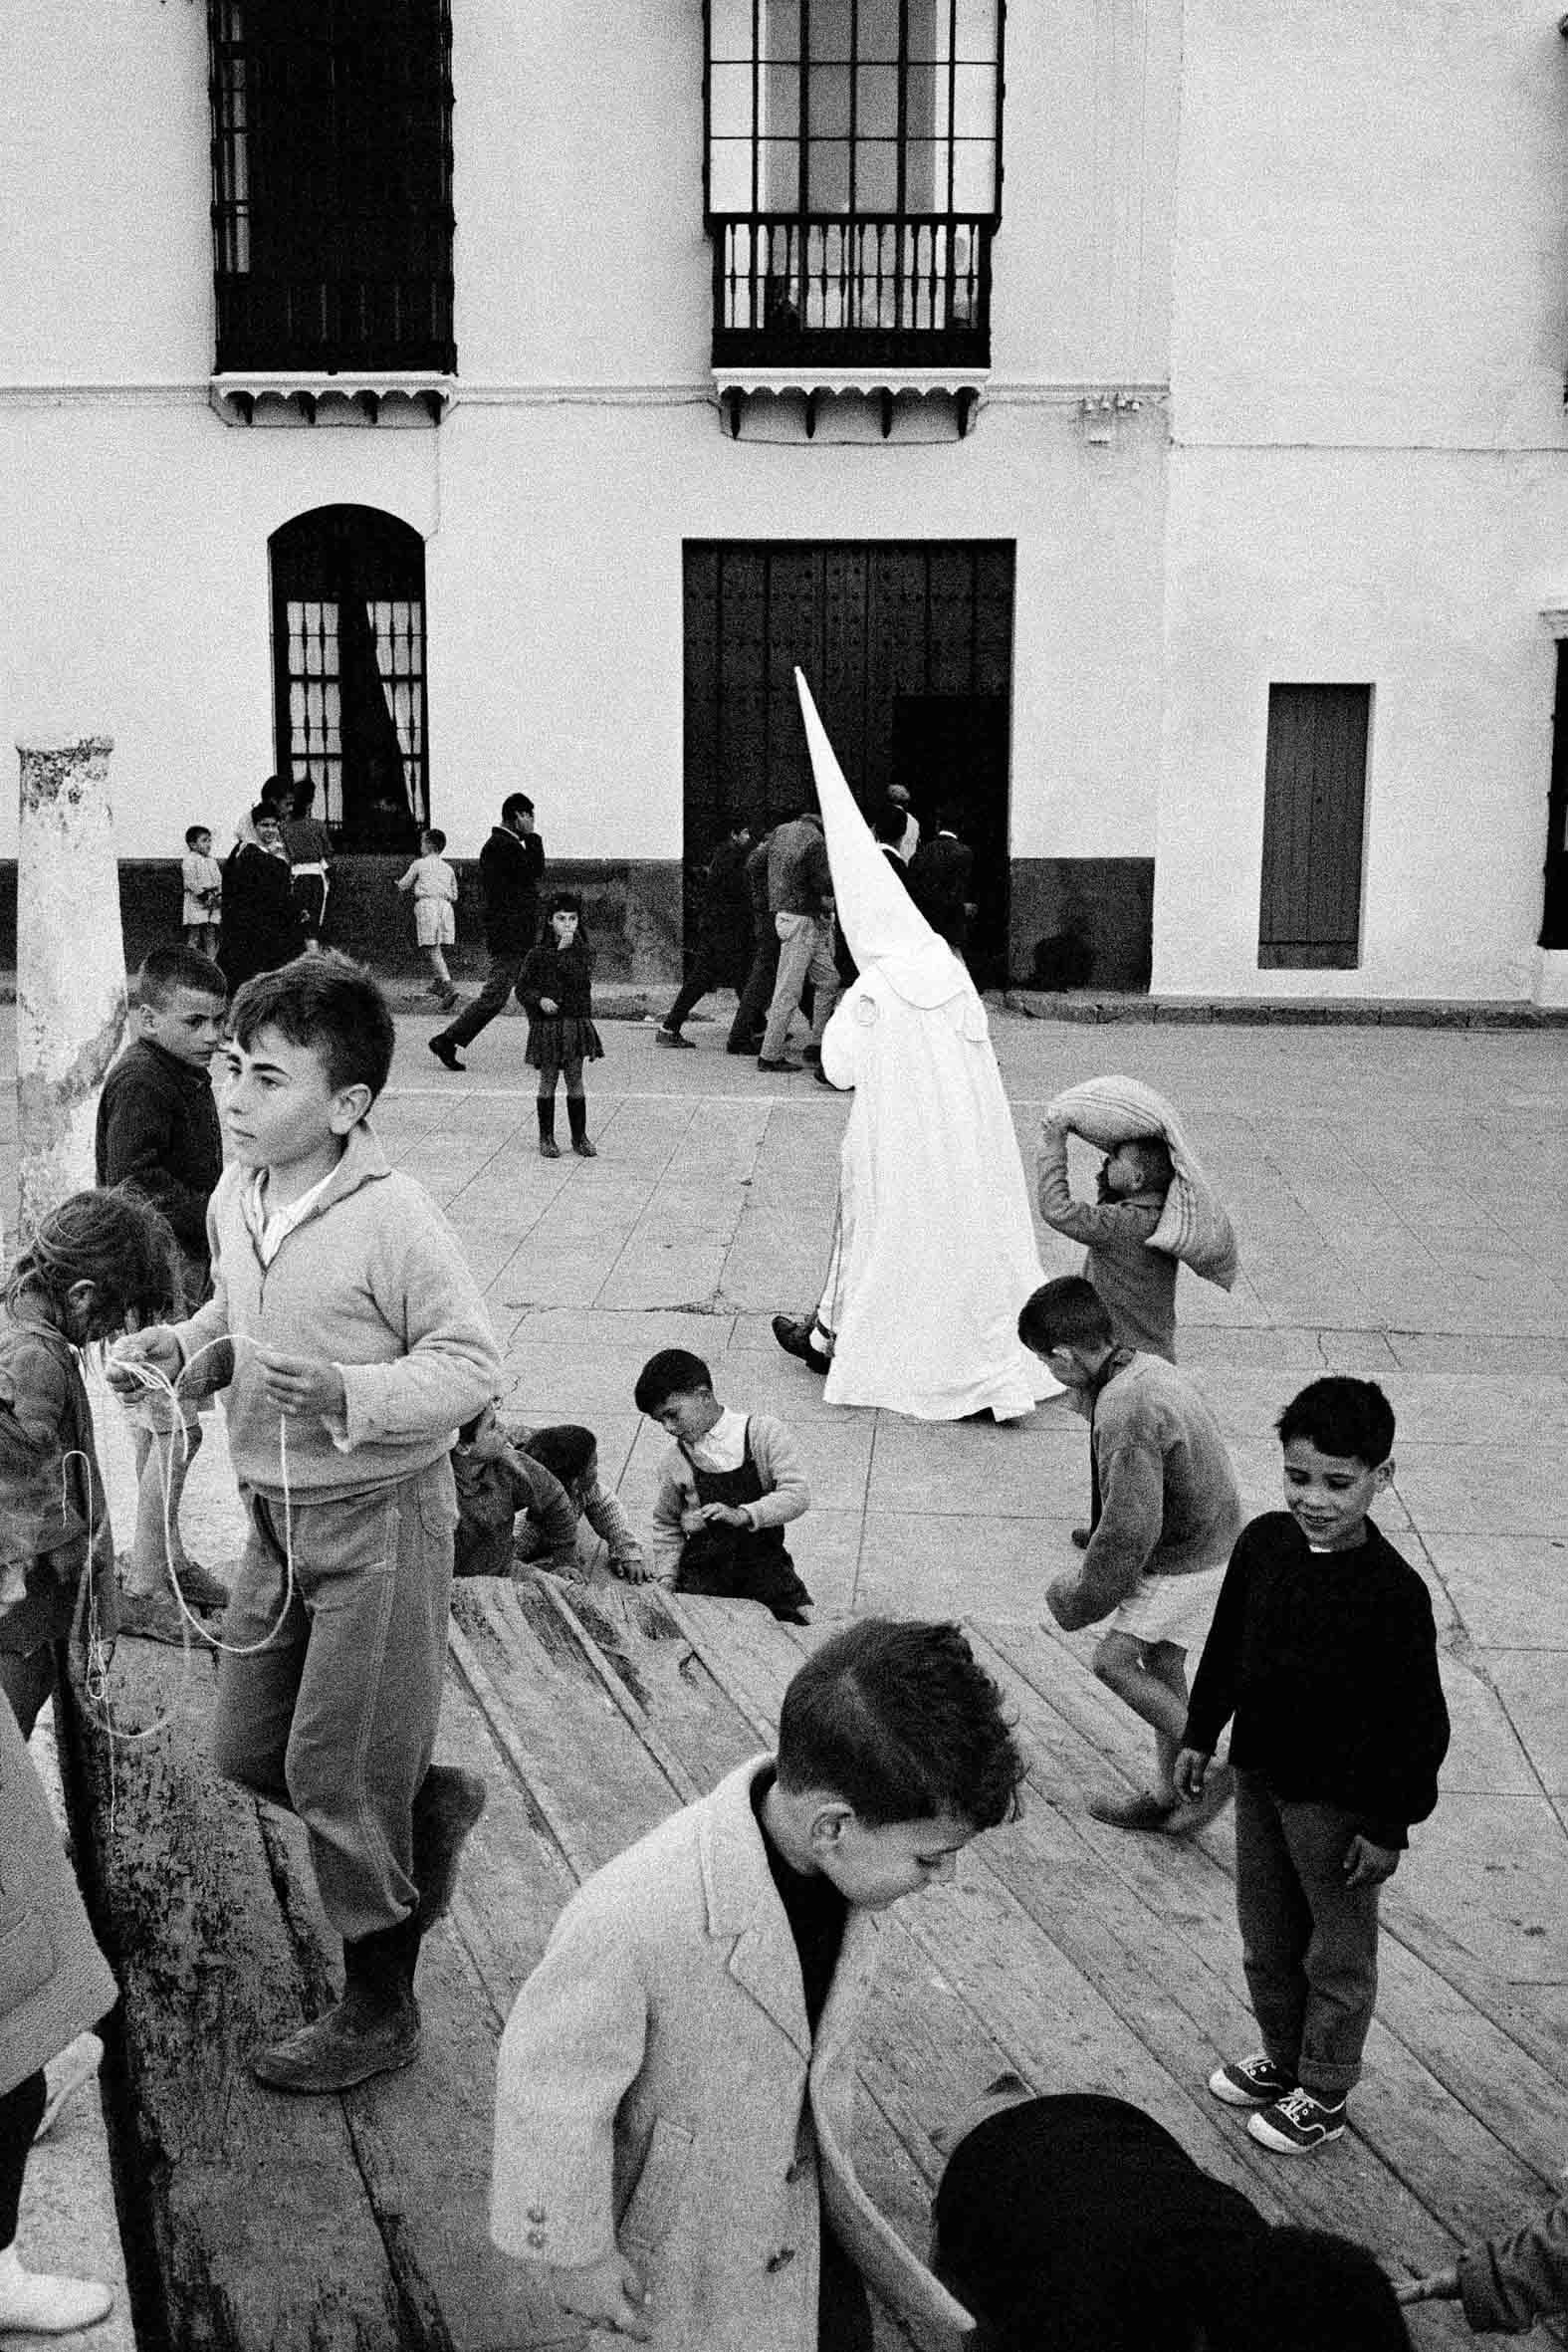 Medina Sidonia. Cádiz, 1959<br/>Gelatina de clorobromuro de plata con tratamiento de archivo al selenio / Silver gelatine with archival selenium treatment